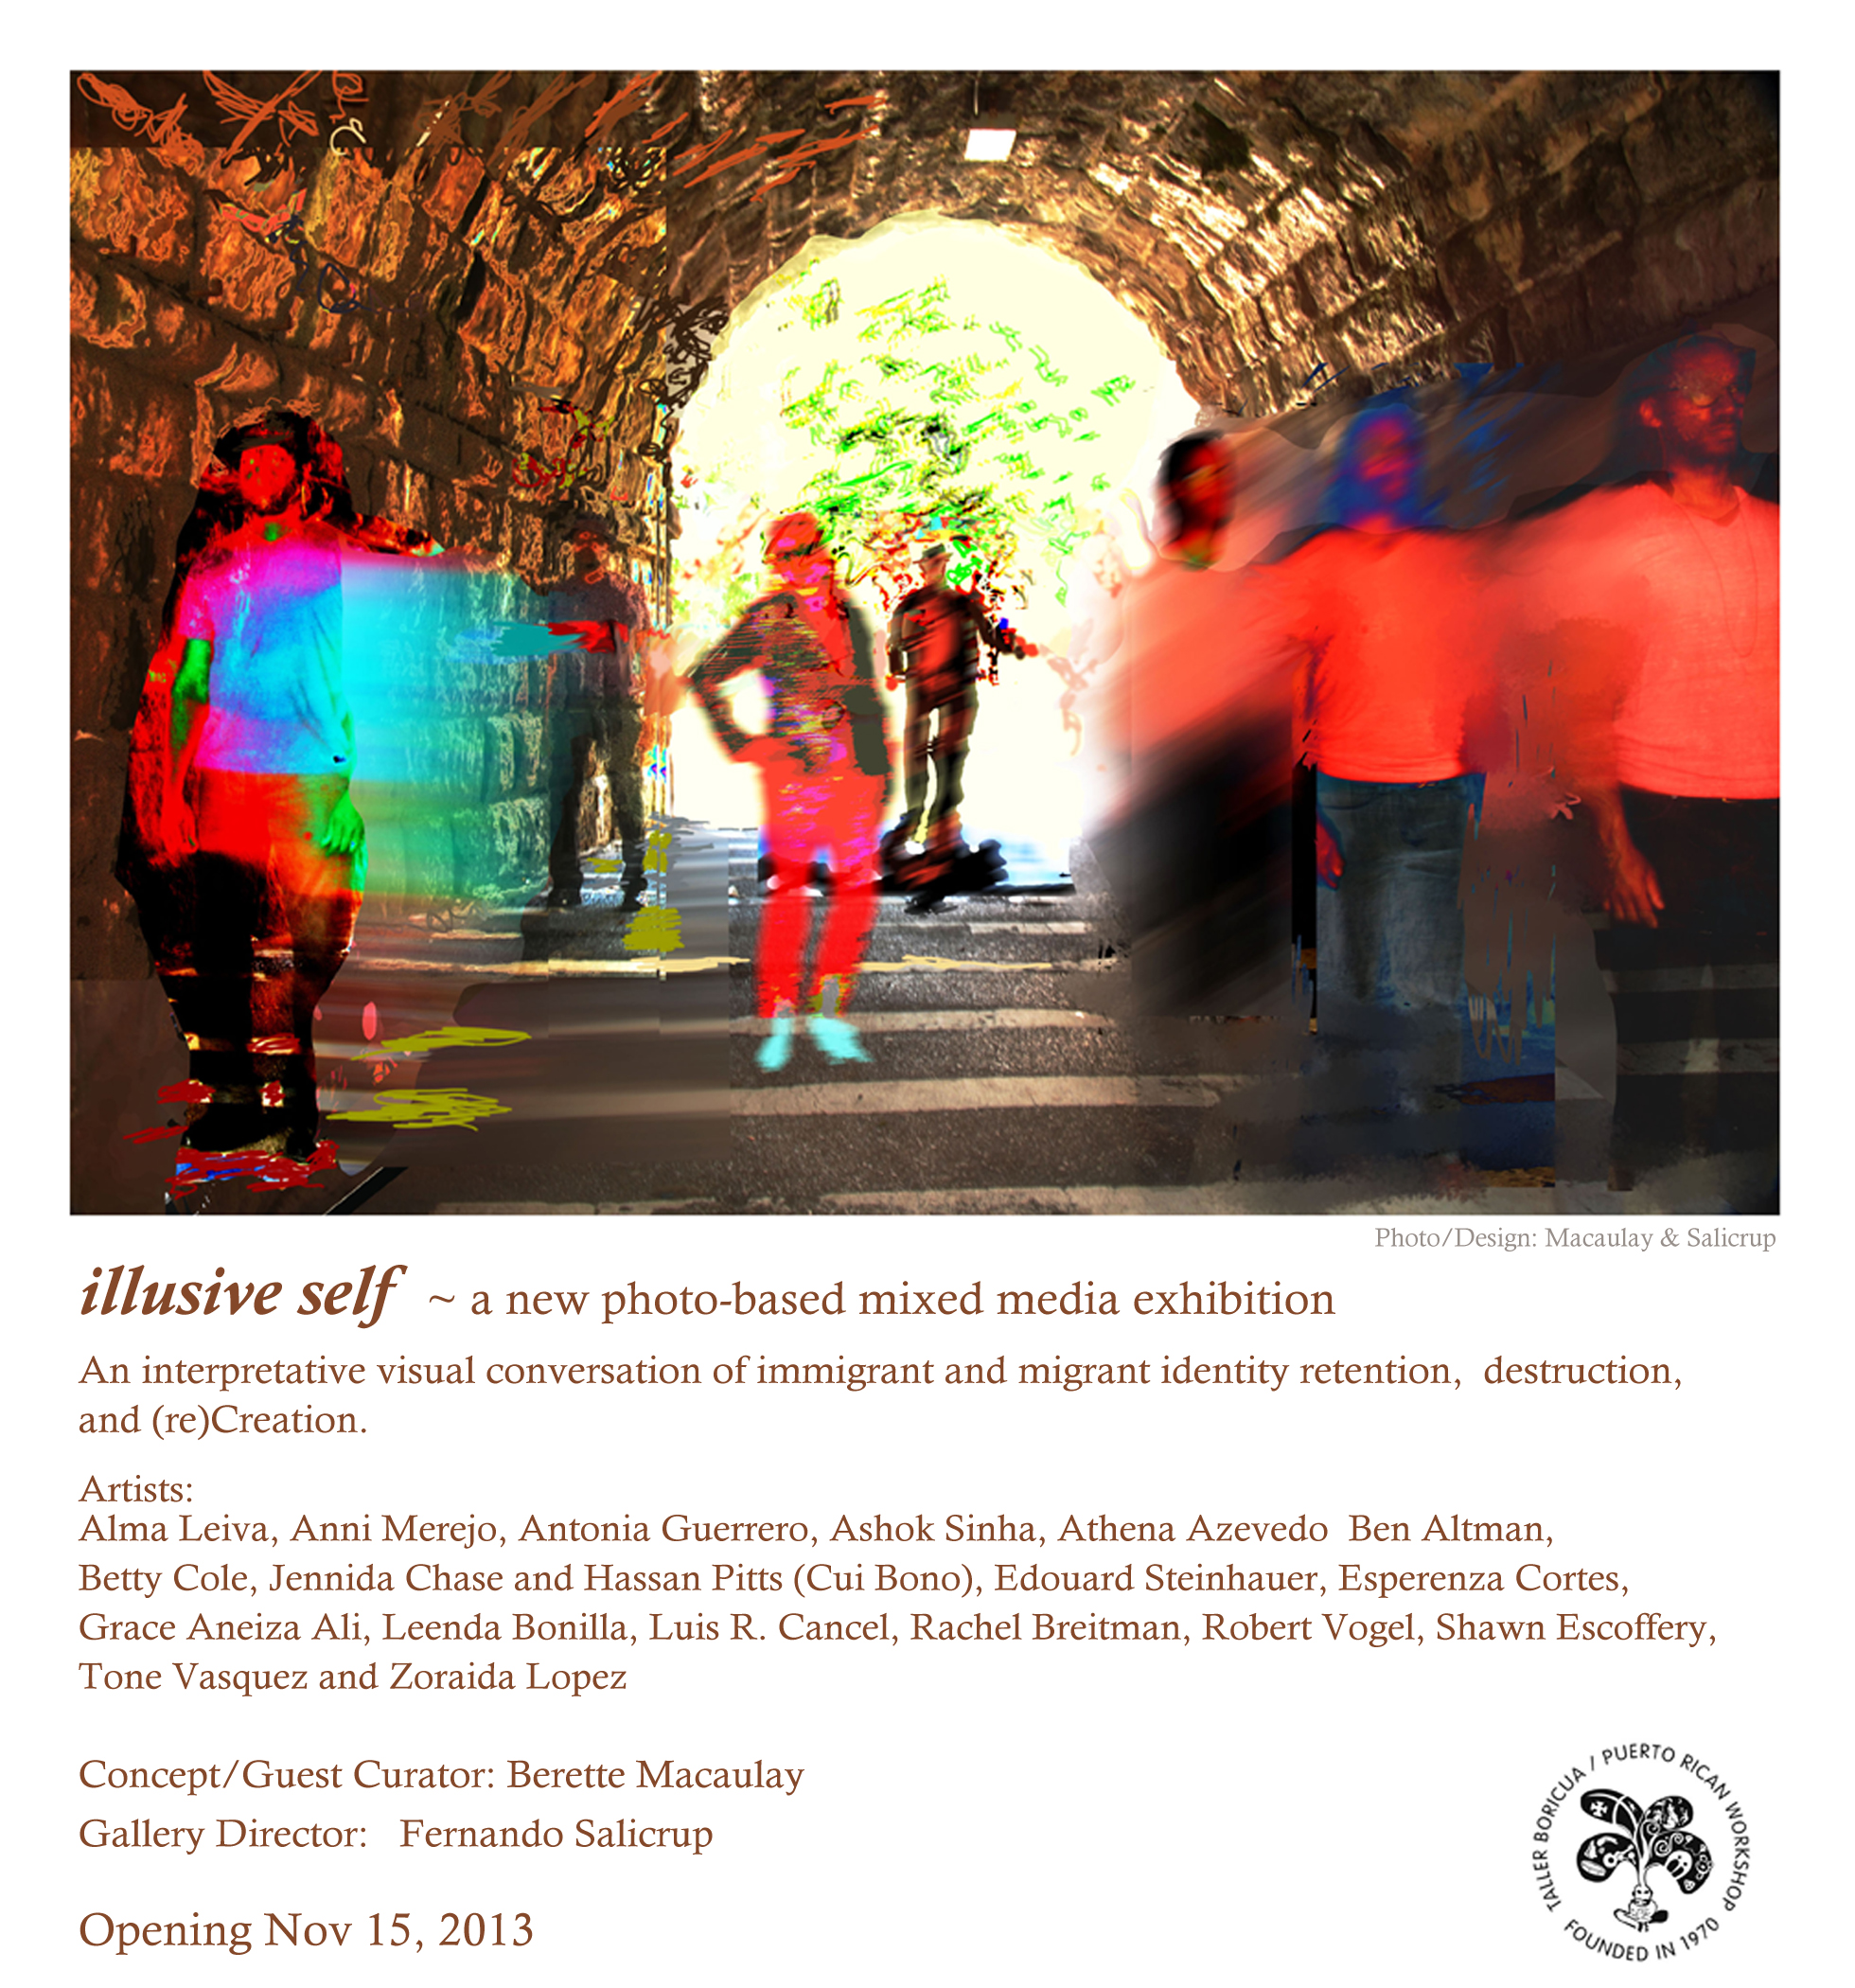 illusive self marketing - show flyer 1*Illusive_Self_Taller_Boricua_©_SeBiArt  007 copy.jpg